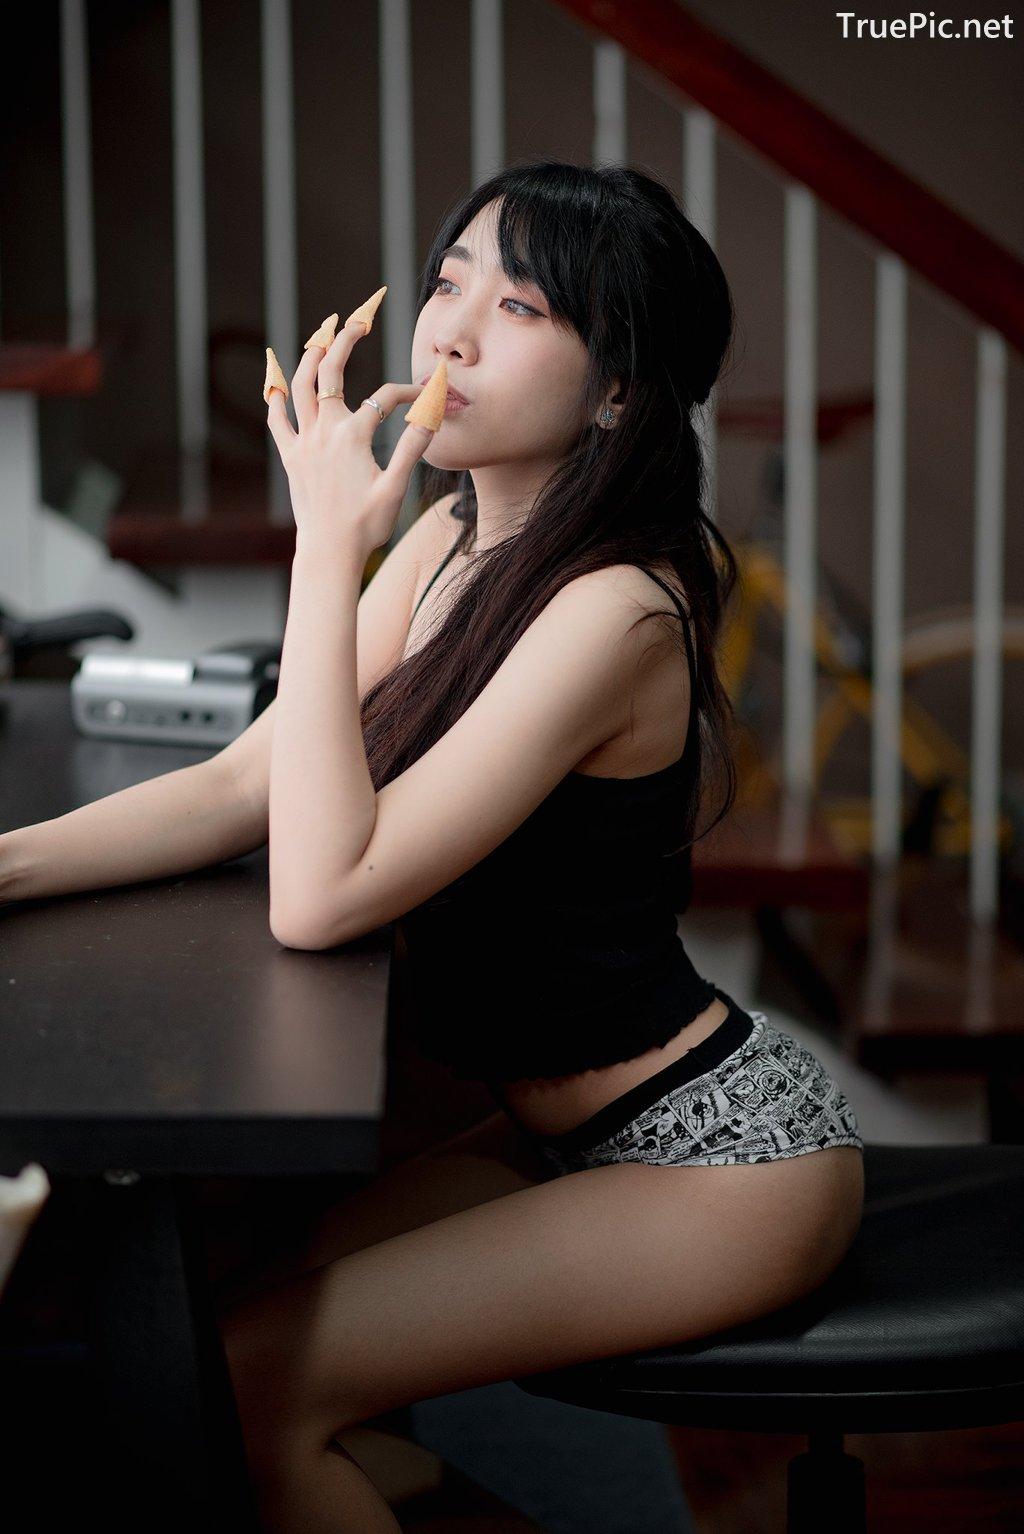 Image Thailand Model - Suneta Ngachalvy - Black Crop Top - TruePic.net - Picture-3